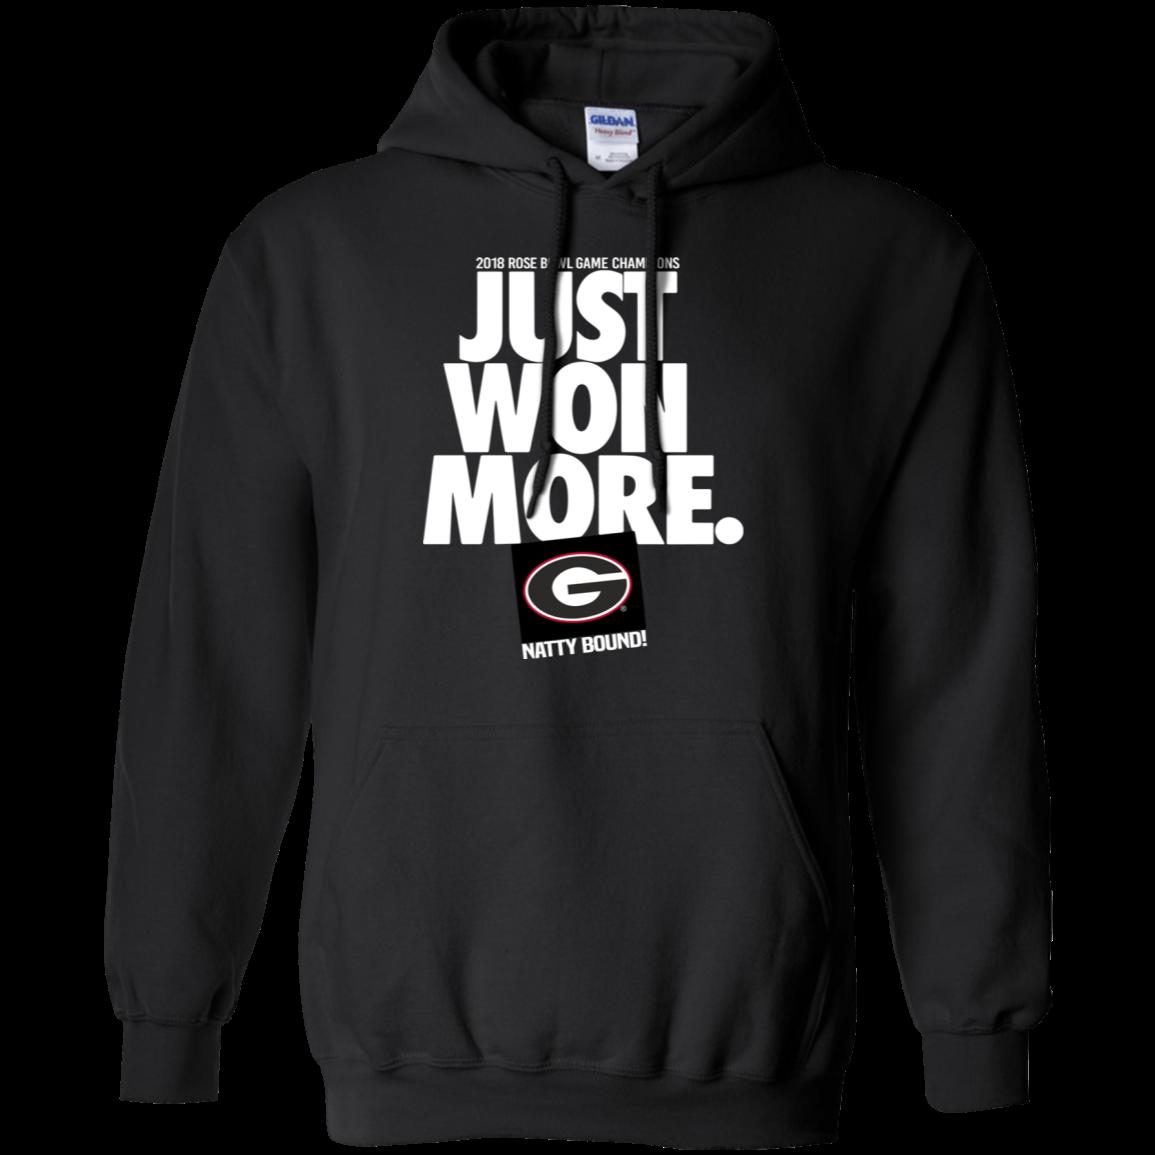 Just Won More Georgia Bulldogs Uga Shirts